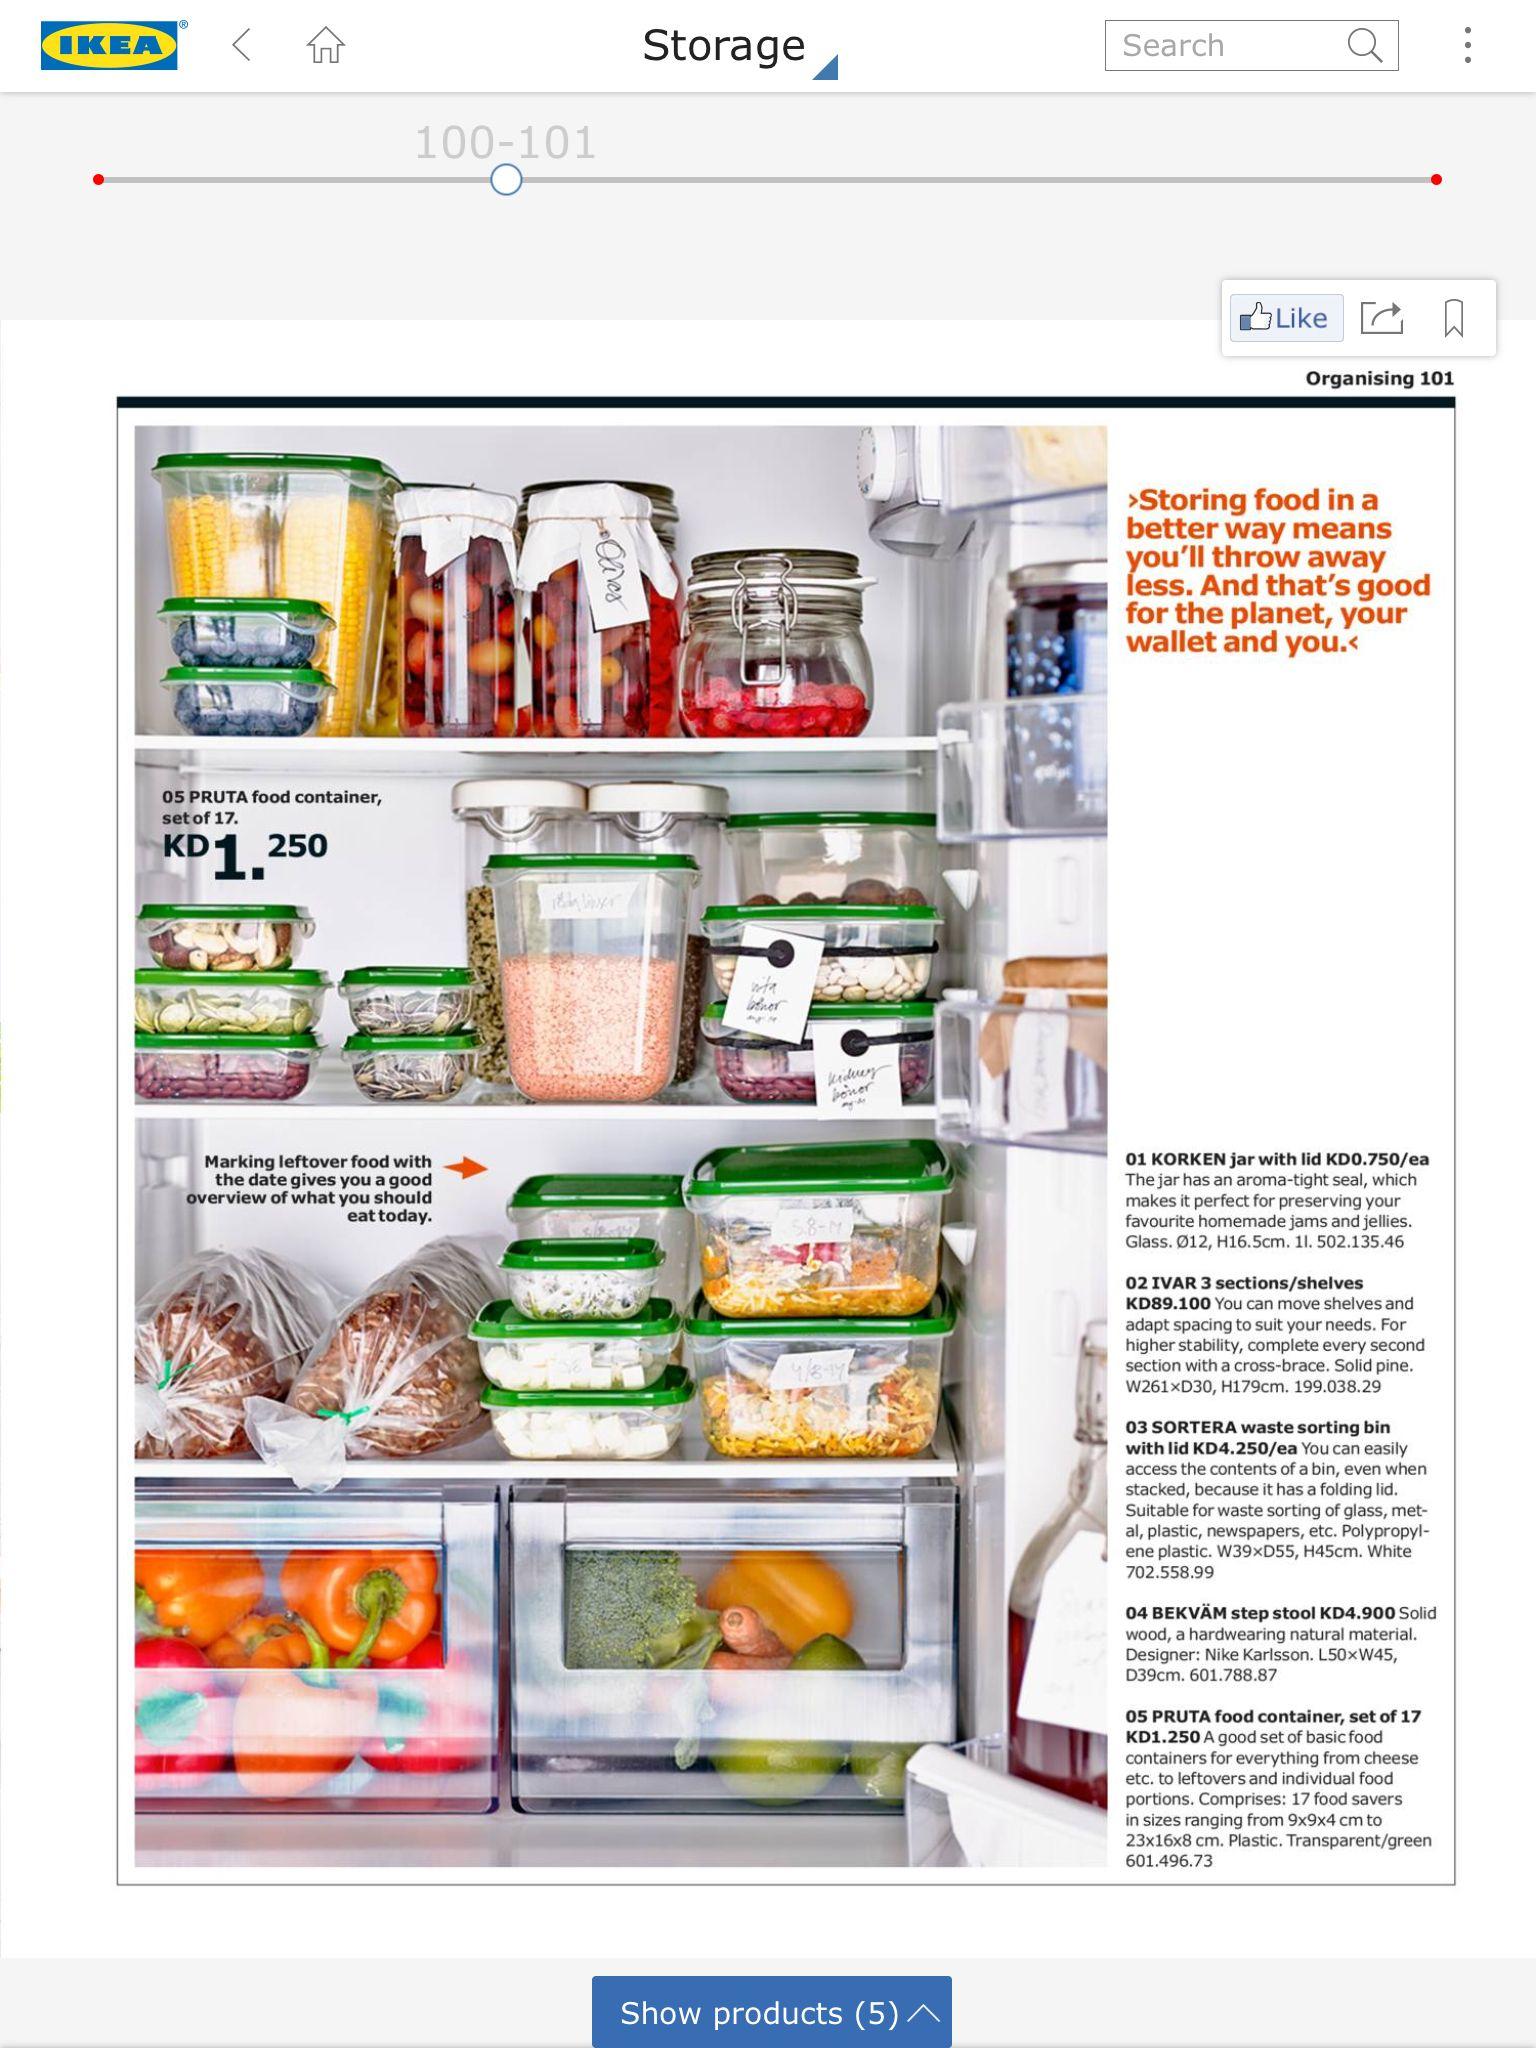 Organized Fridg Refrigerator Organization Fridge Organization